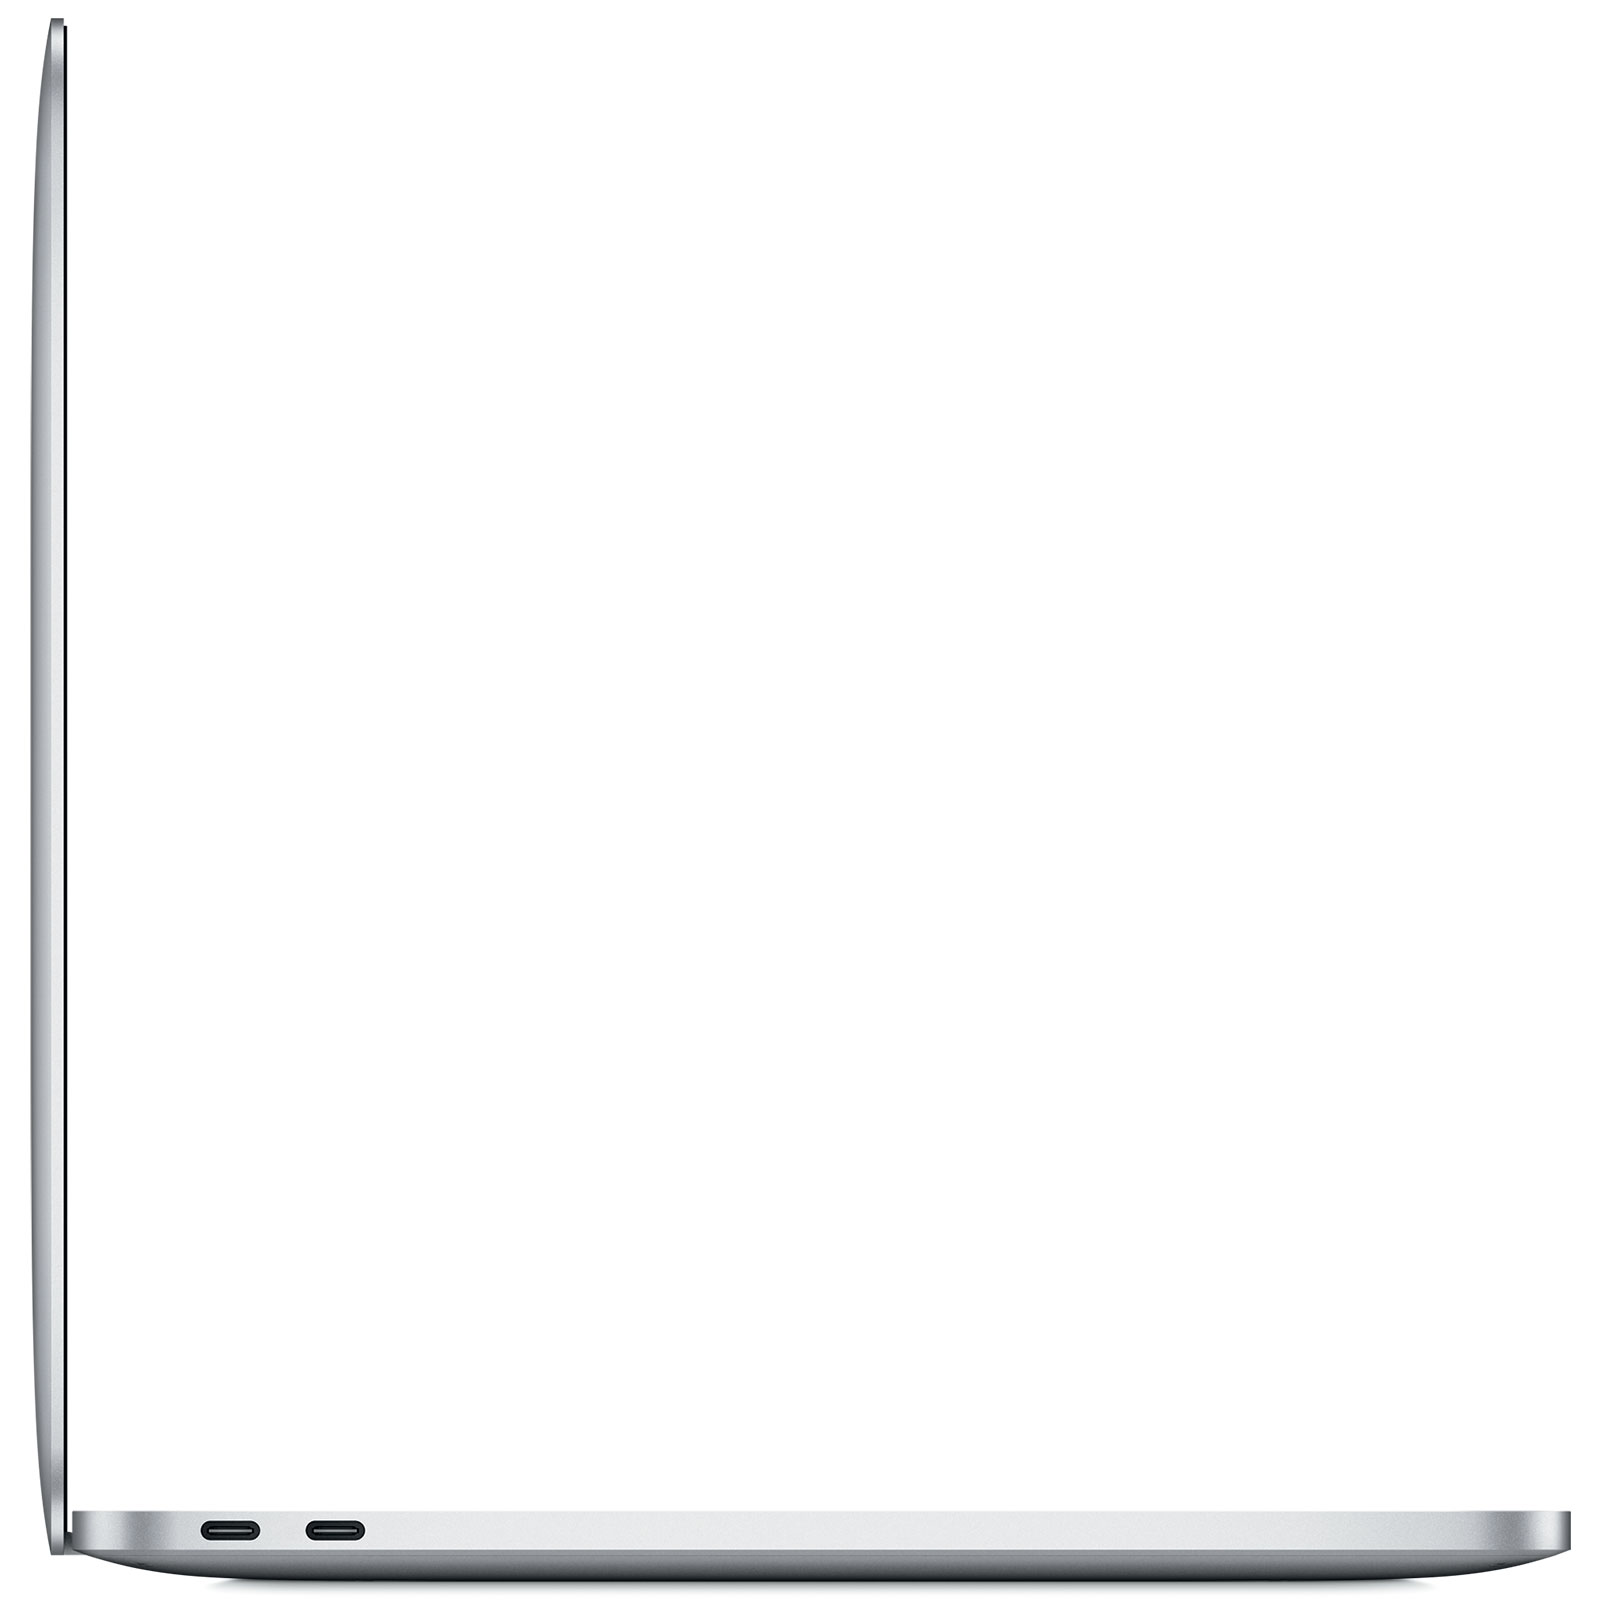 apple macbook pro 13 argent mluq2fn a macbook apple sur ldlc. Black Bedroom Furniture Sets. Home Design Ideas